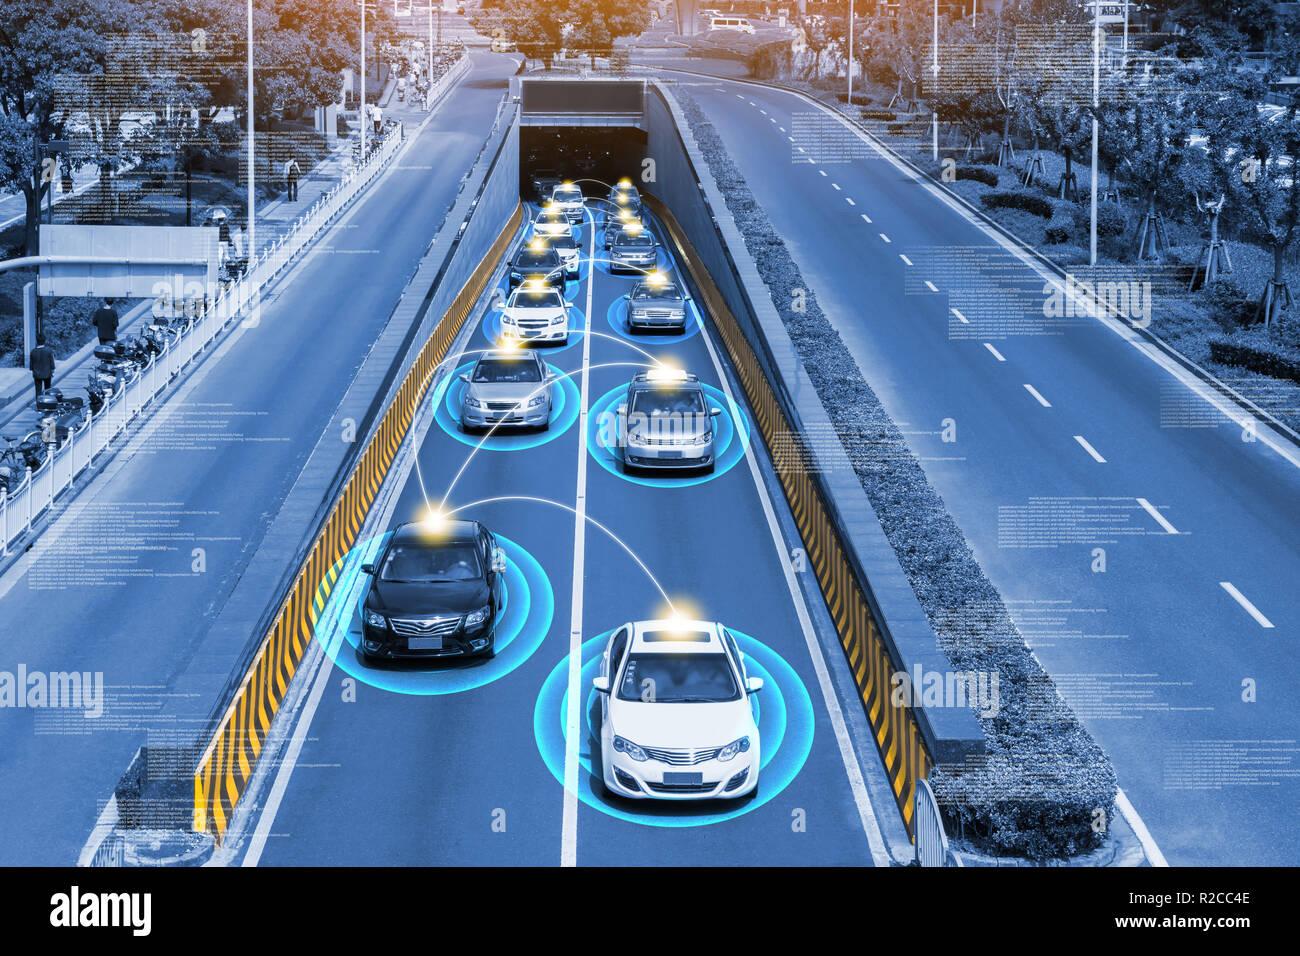 Smart car (HUD) , Autonomous self-driving mode vehicle on metro city road iot concept with graphic sensor radar signal system and internet sensor conn - Stock Image